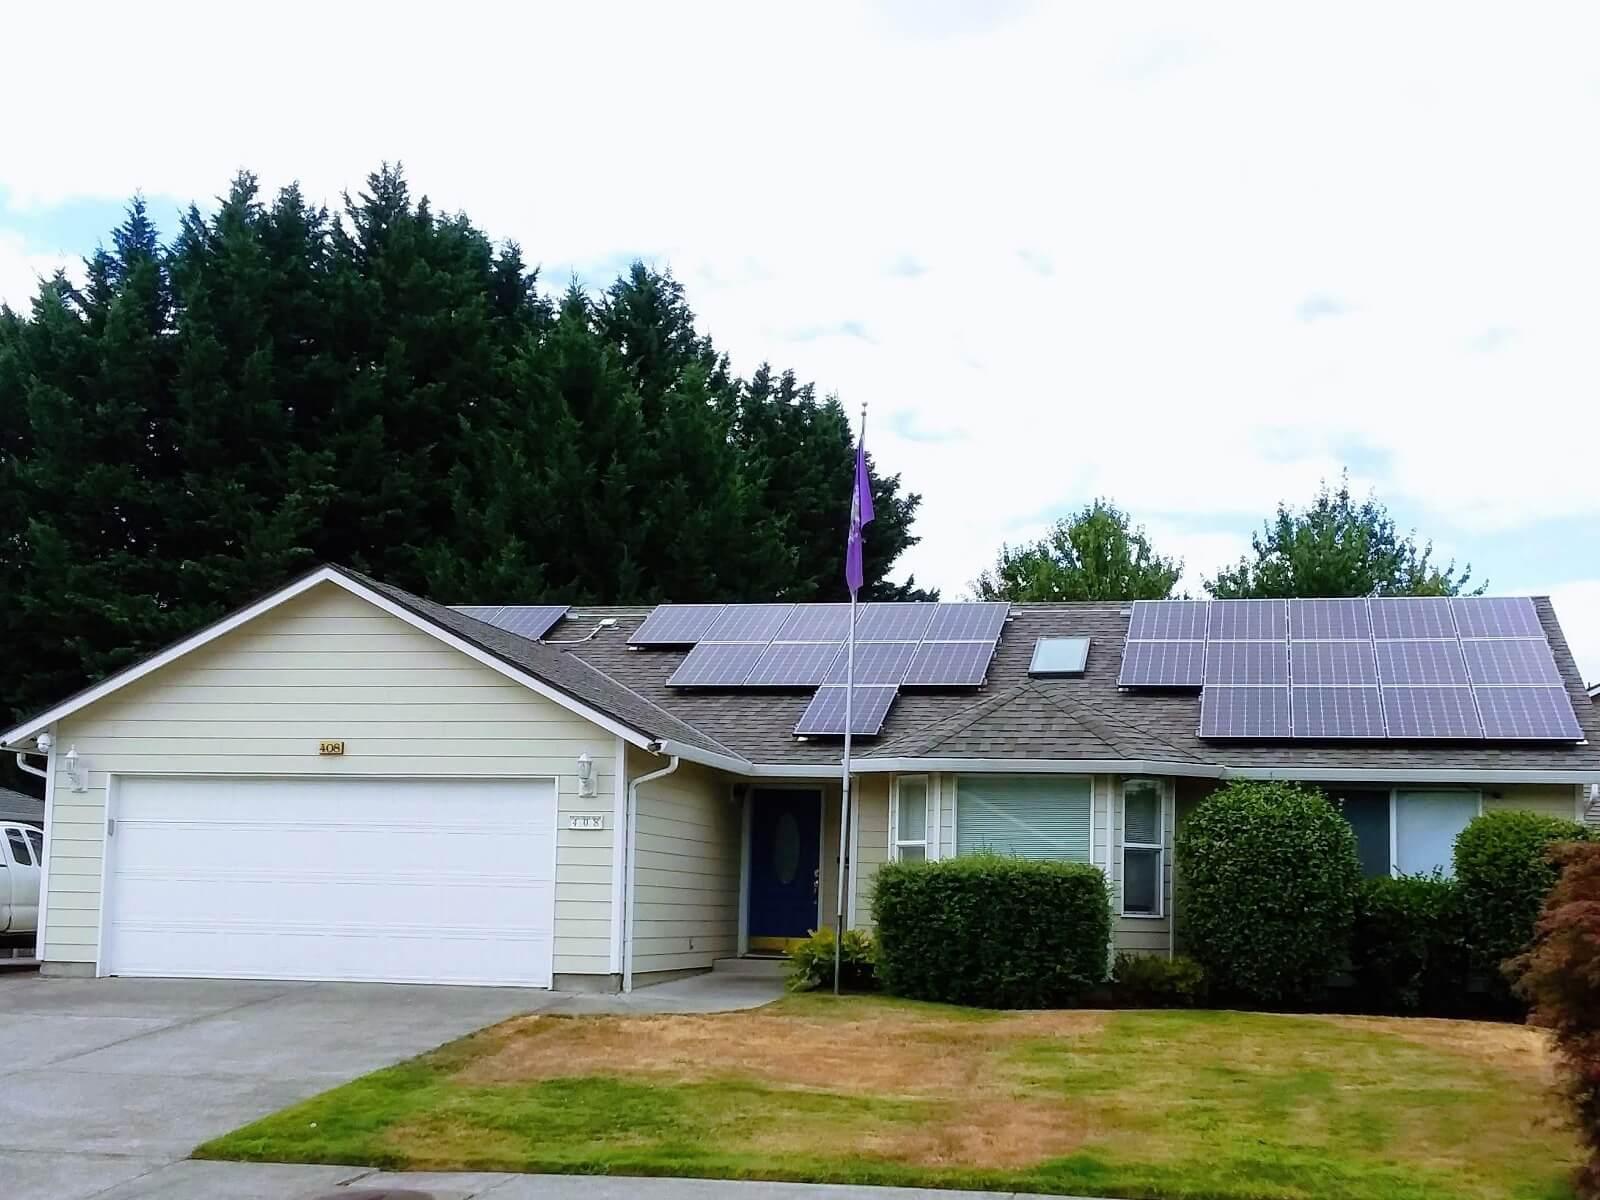 solar panels on home.jpeg